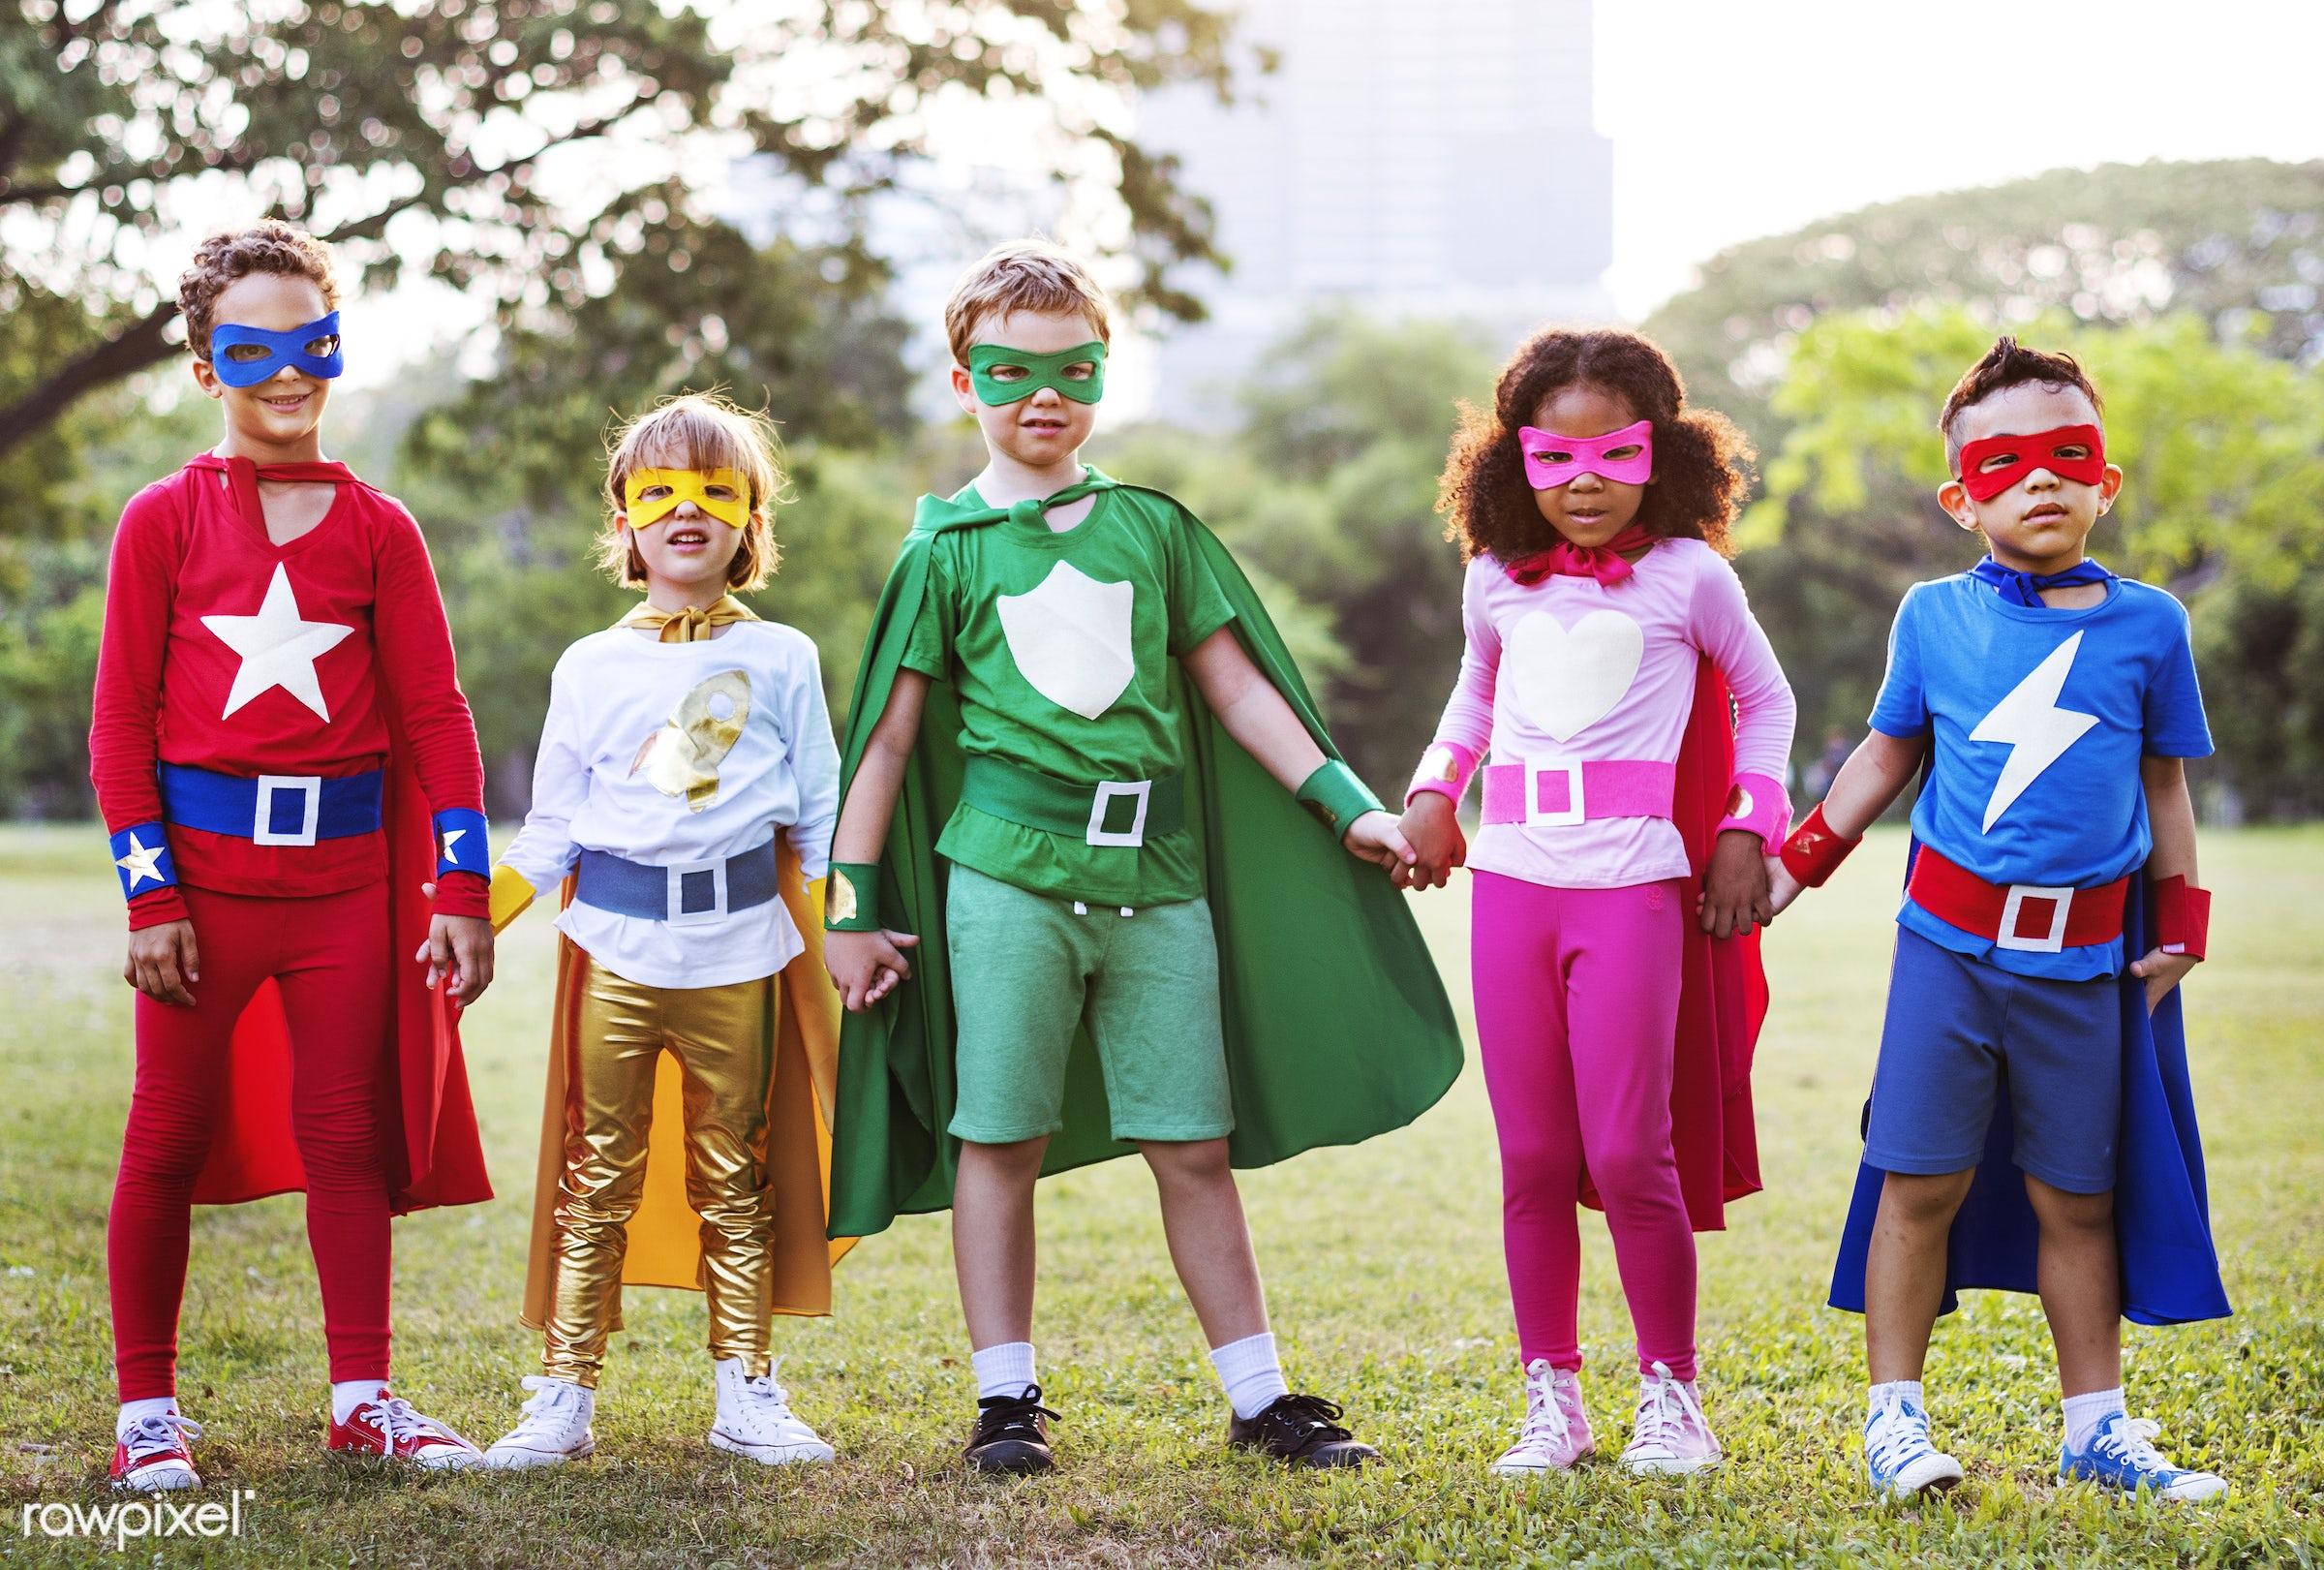 superhero, african descent, asian ethnicity, aspirations, boys, brave, cheerful, child, childhood, children, costume, dream...